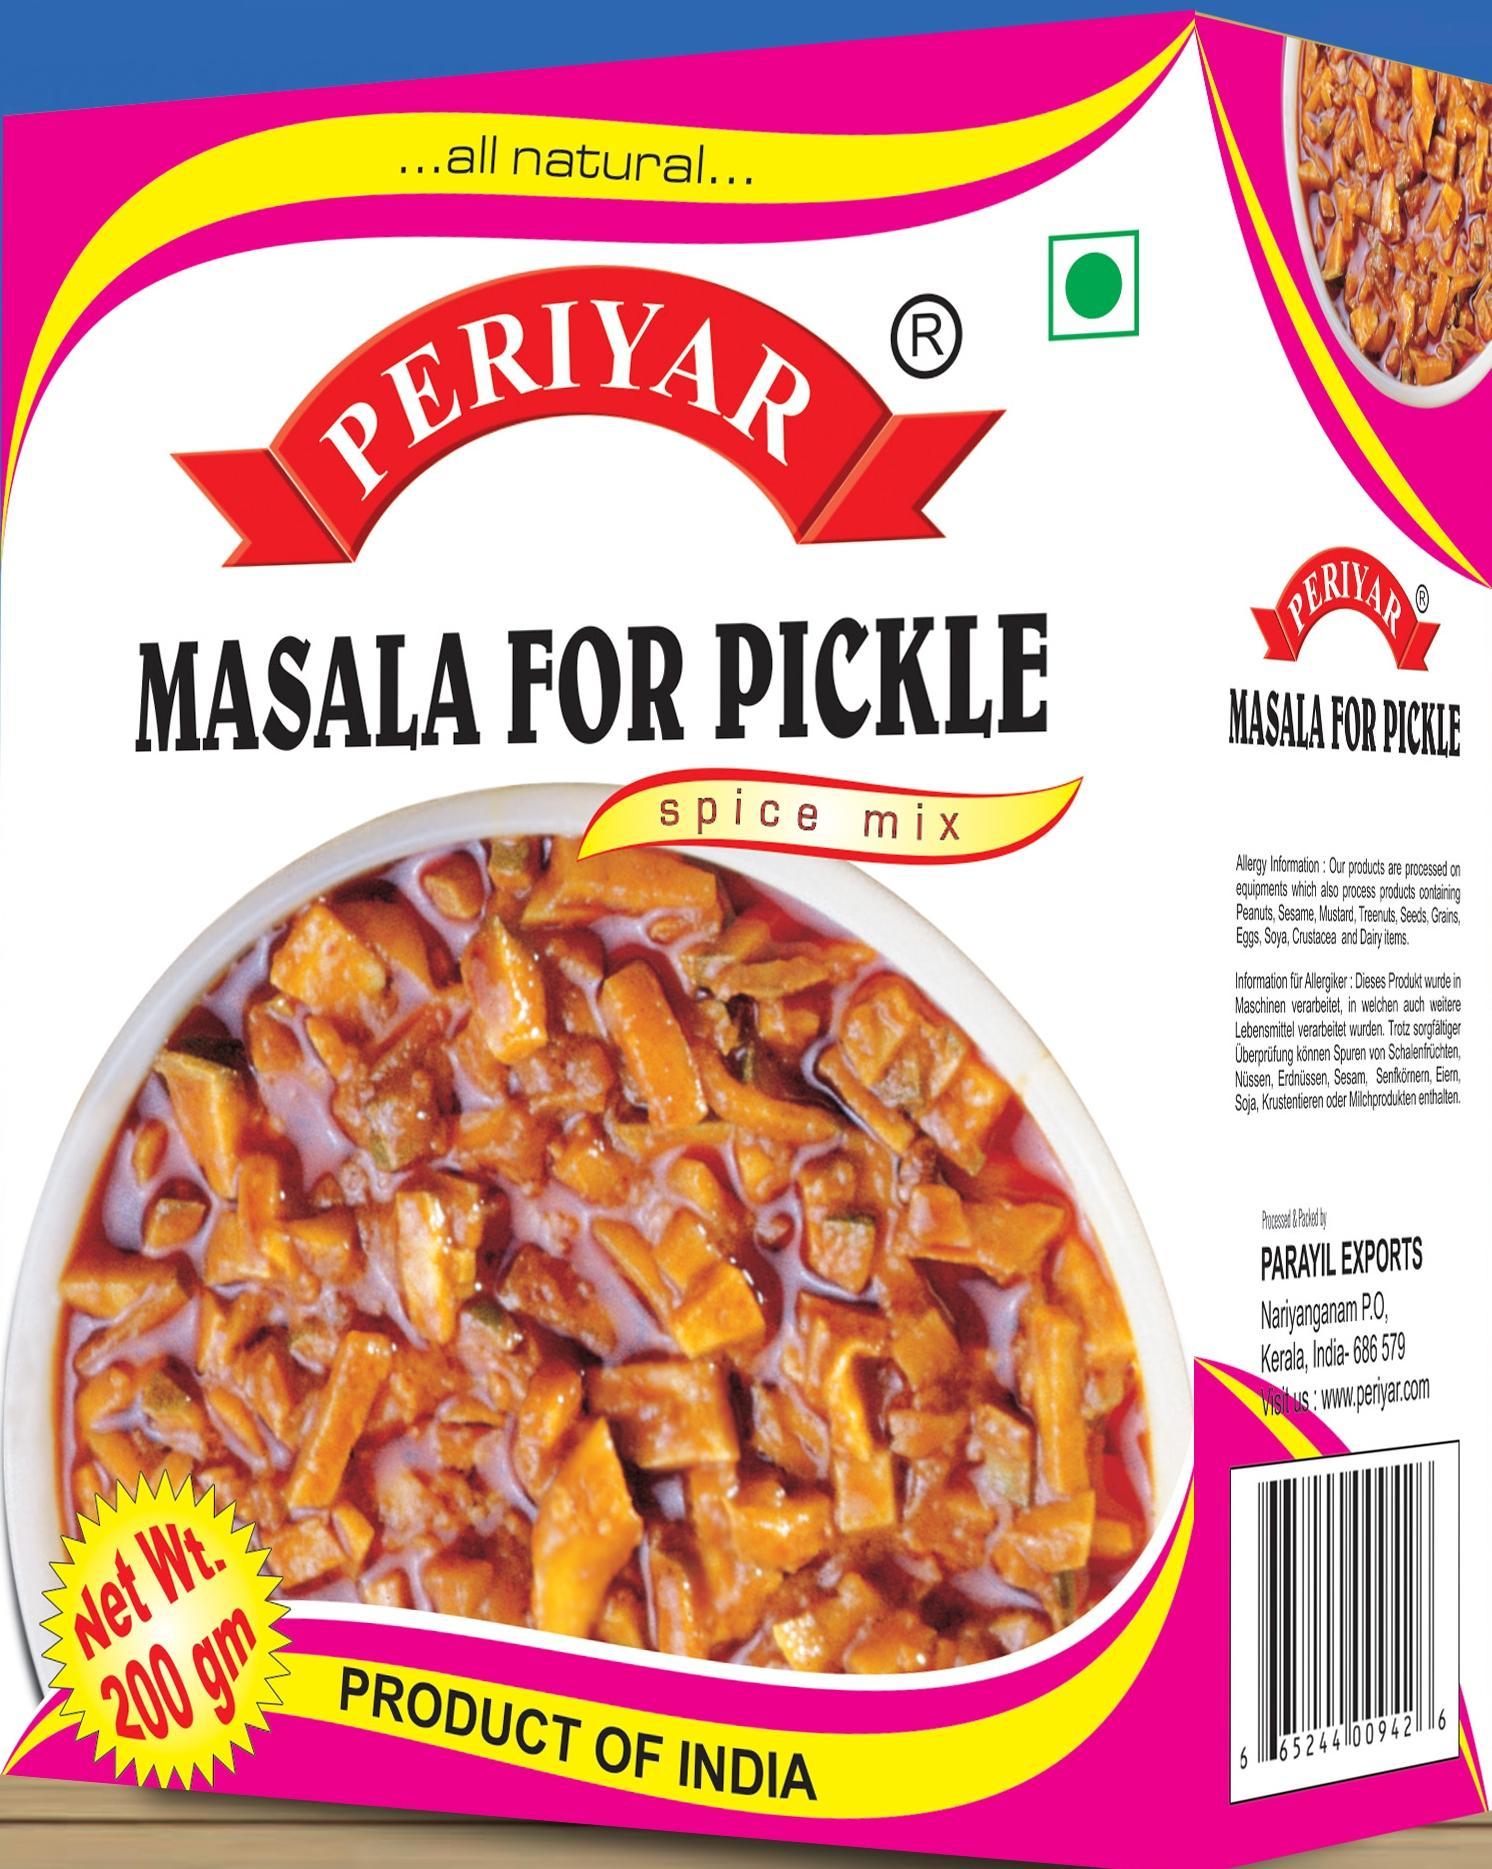 Periyar Masala for Pickle